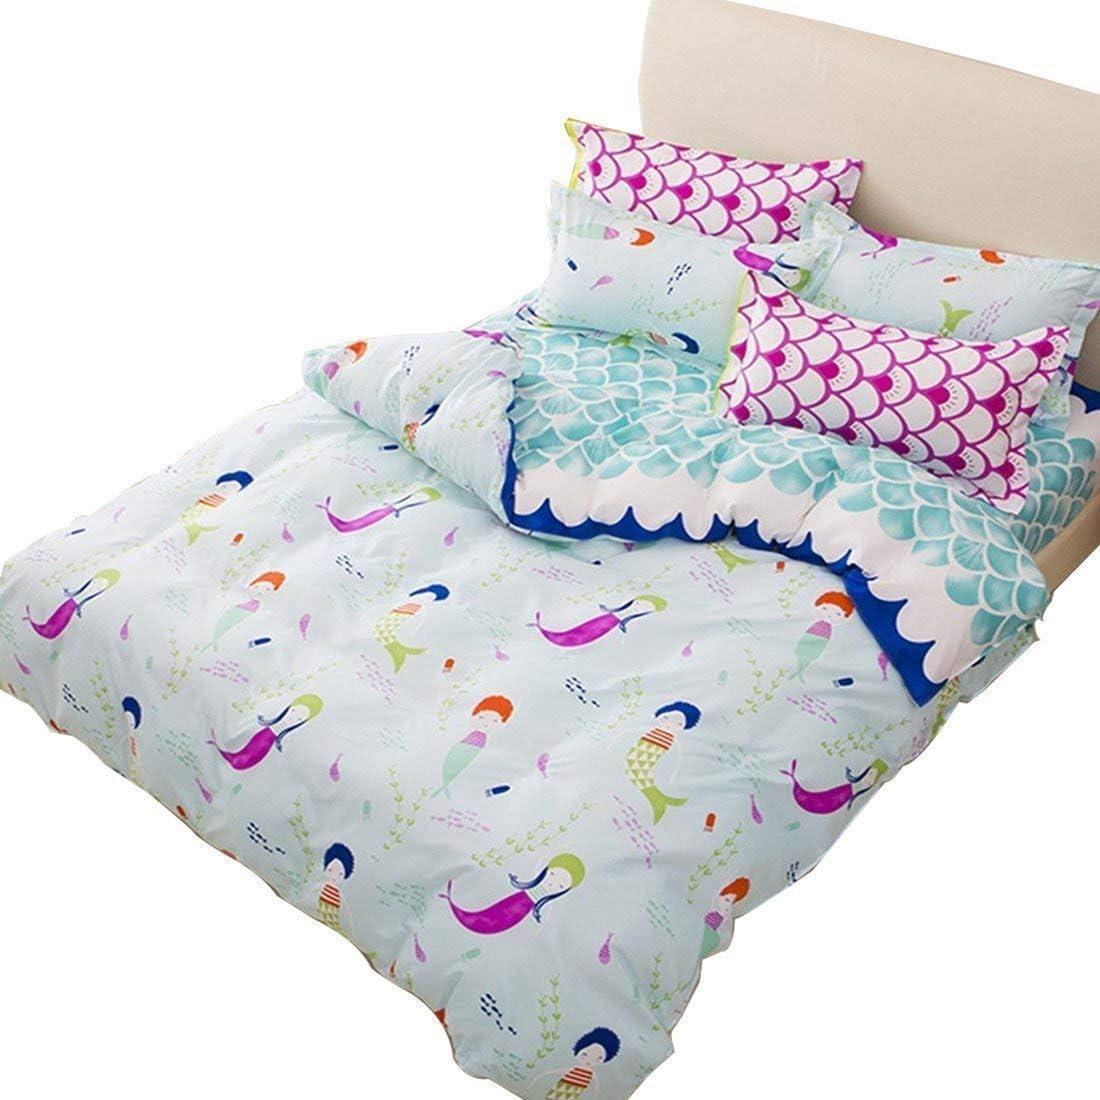 Lemontree Mermaid Bedding Set - Girls Soft Duvet Cover Set -NOT COMFORTER JUST COVER- Blue Wave Small Mermaid Pattern,Hypoallergenic,Microfiber,1 Duvet Cover+2 Pillowcases(Twin,# 01)